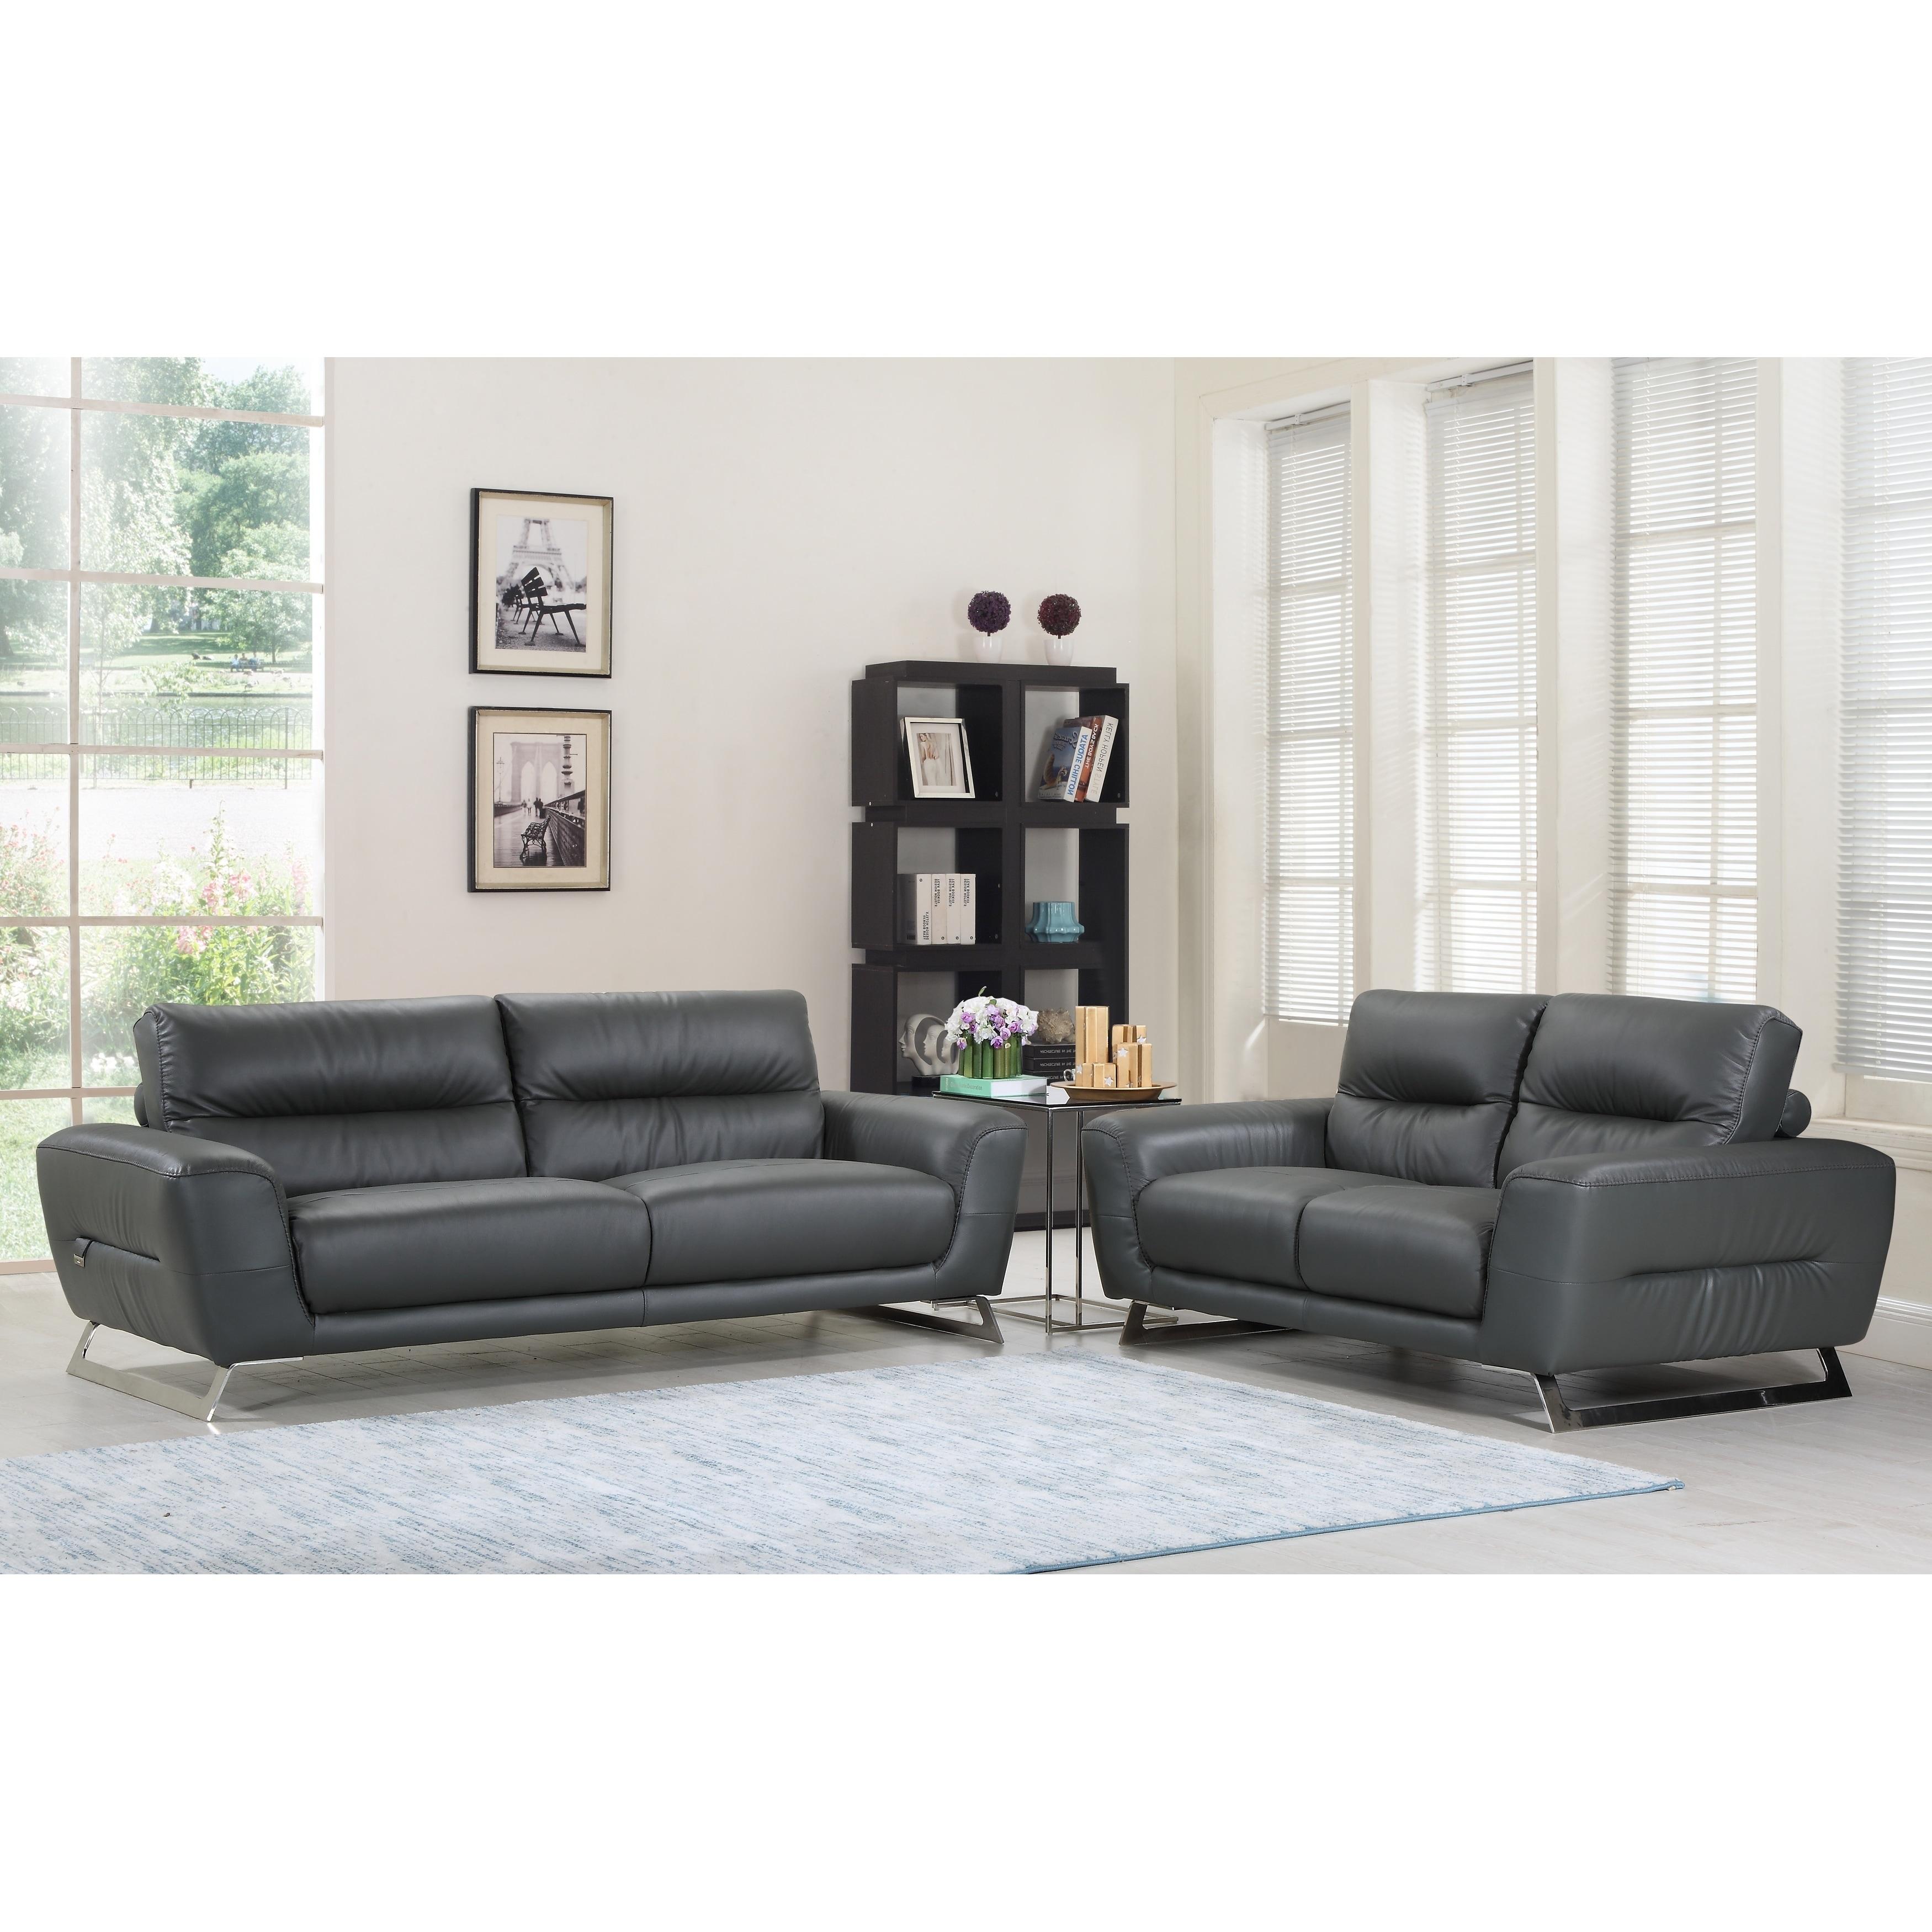 DivanItalia Torino Luxury Italian Leather Upholstered 2-Piece Living ...